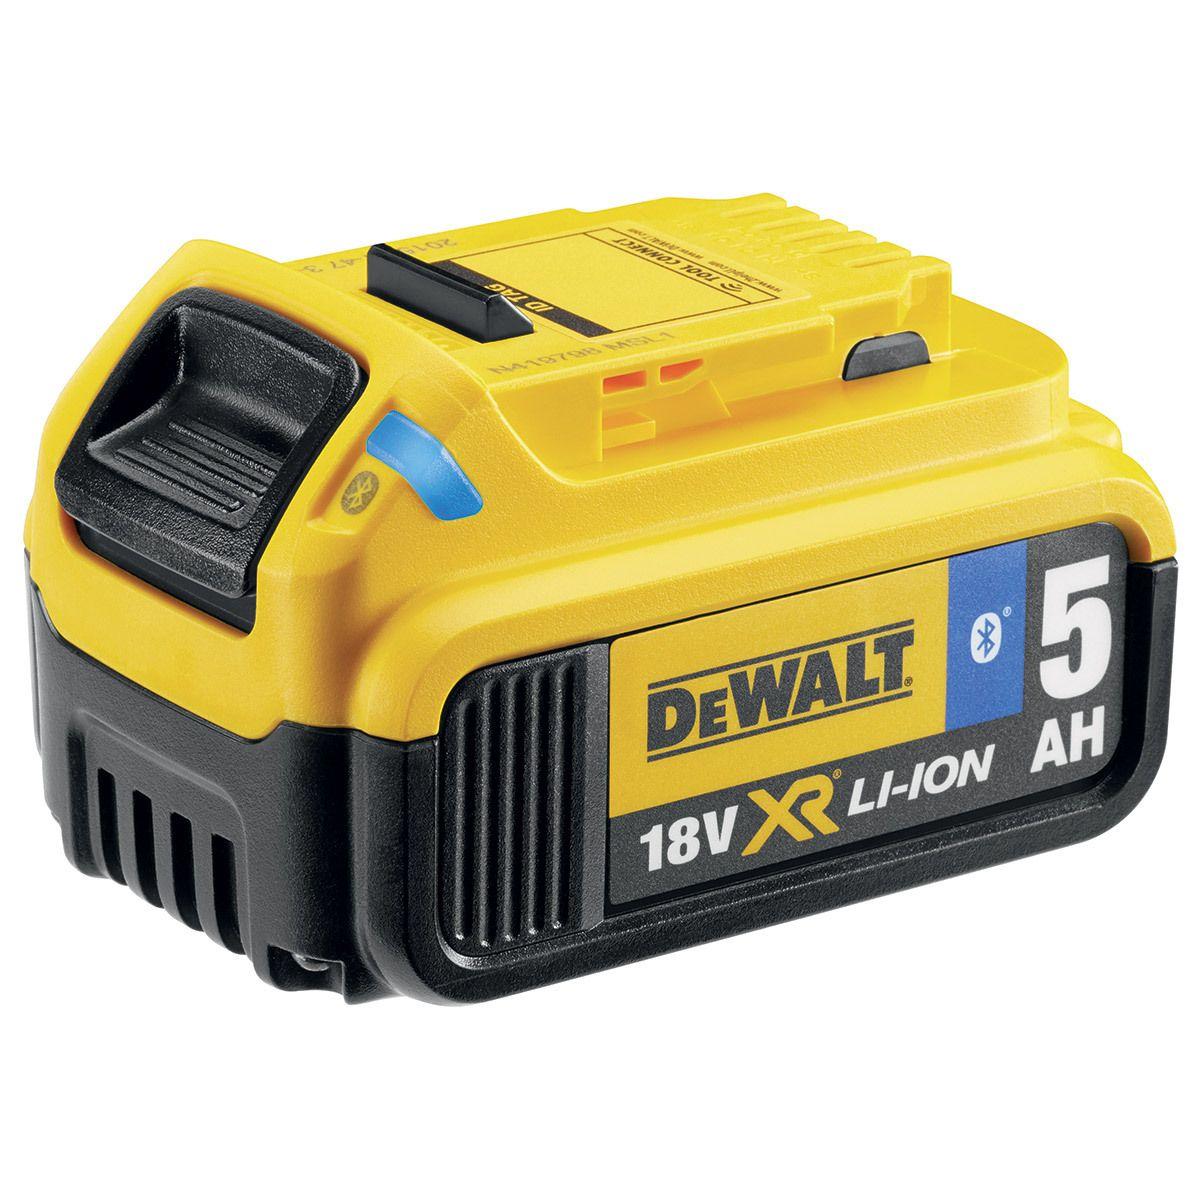 Dewalt 18 V XR Li-Ion 5,0 Ah zásuvný akumulátor s Bluetooth